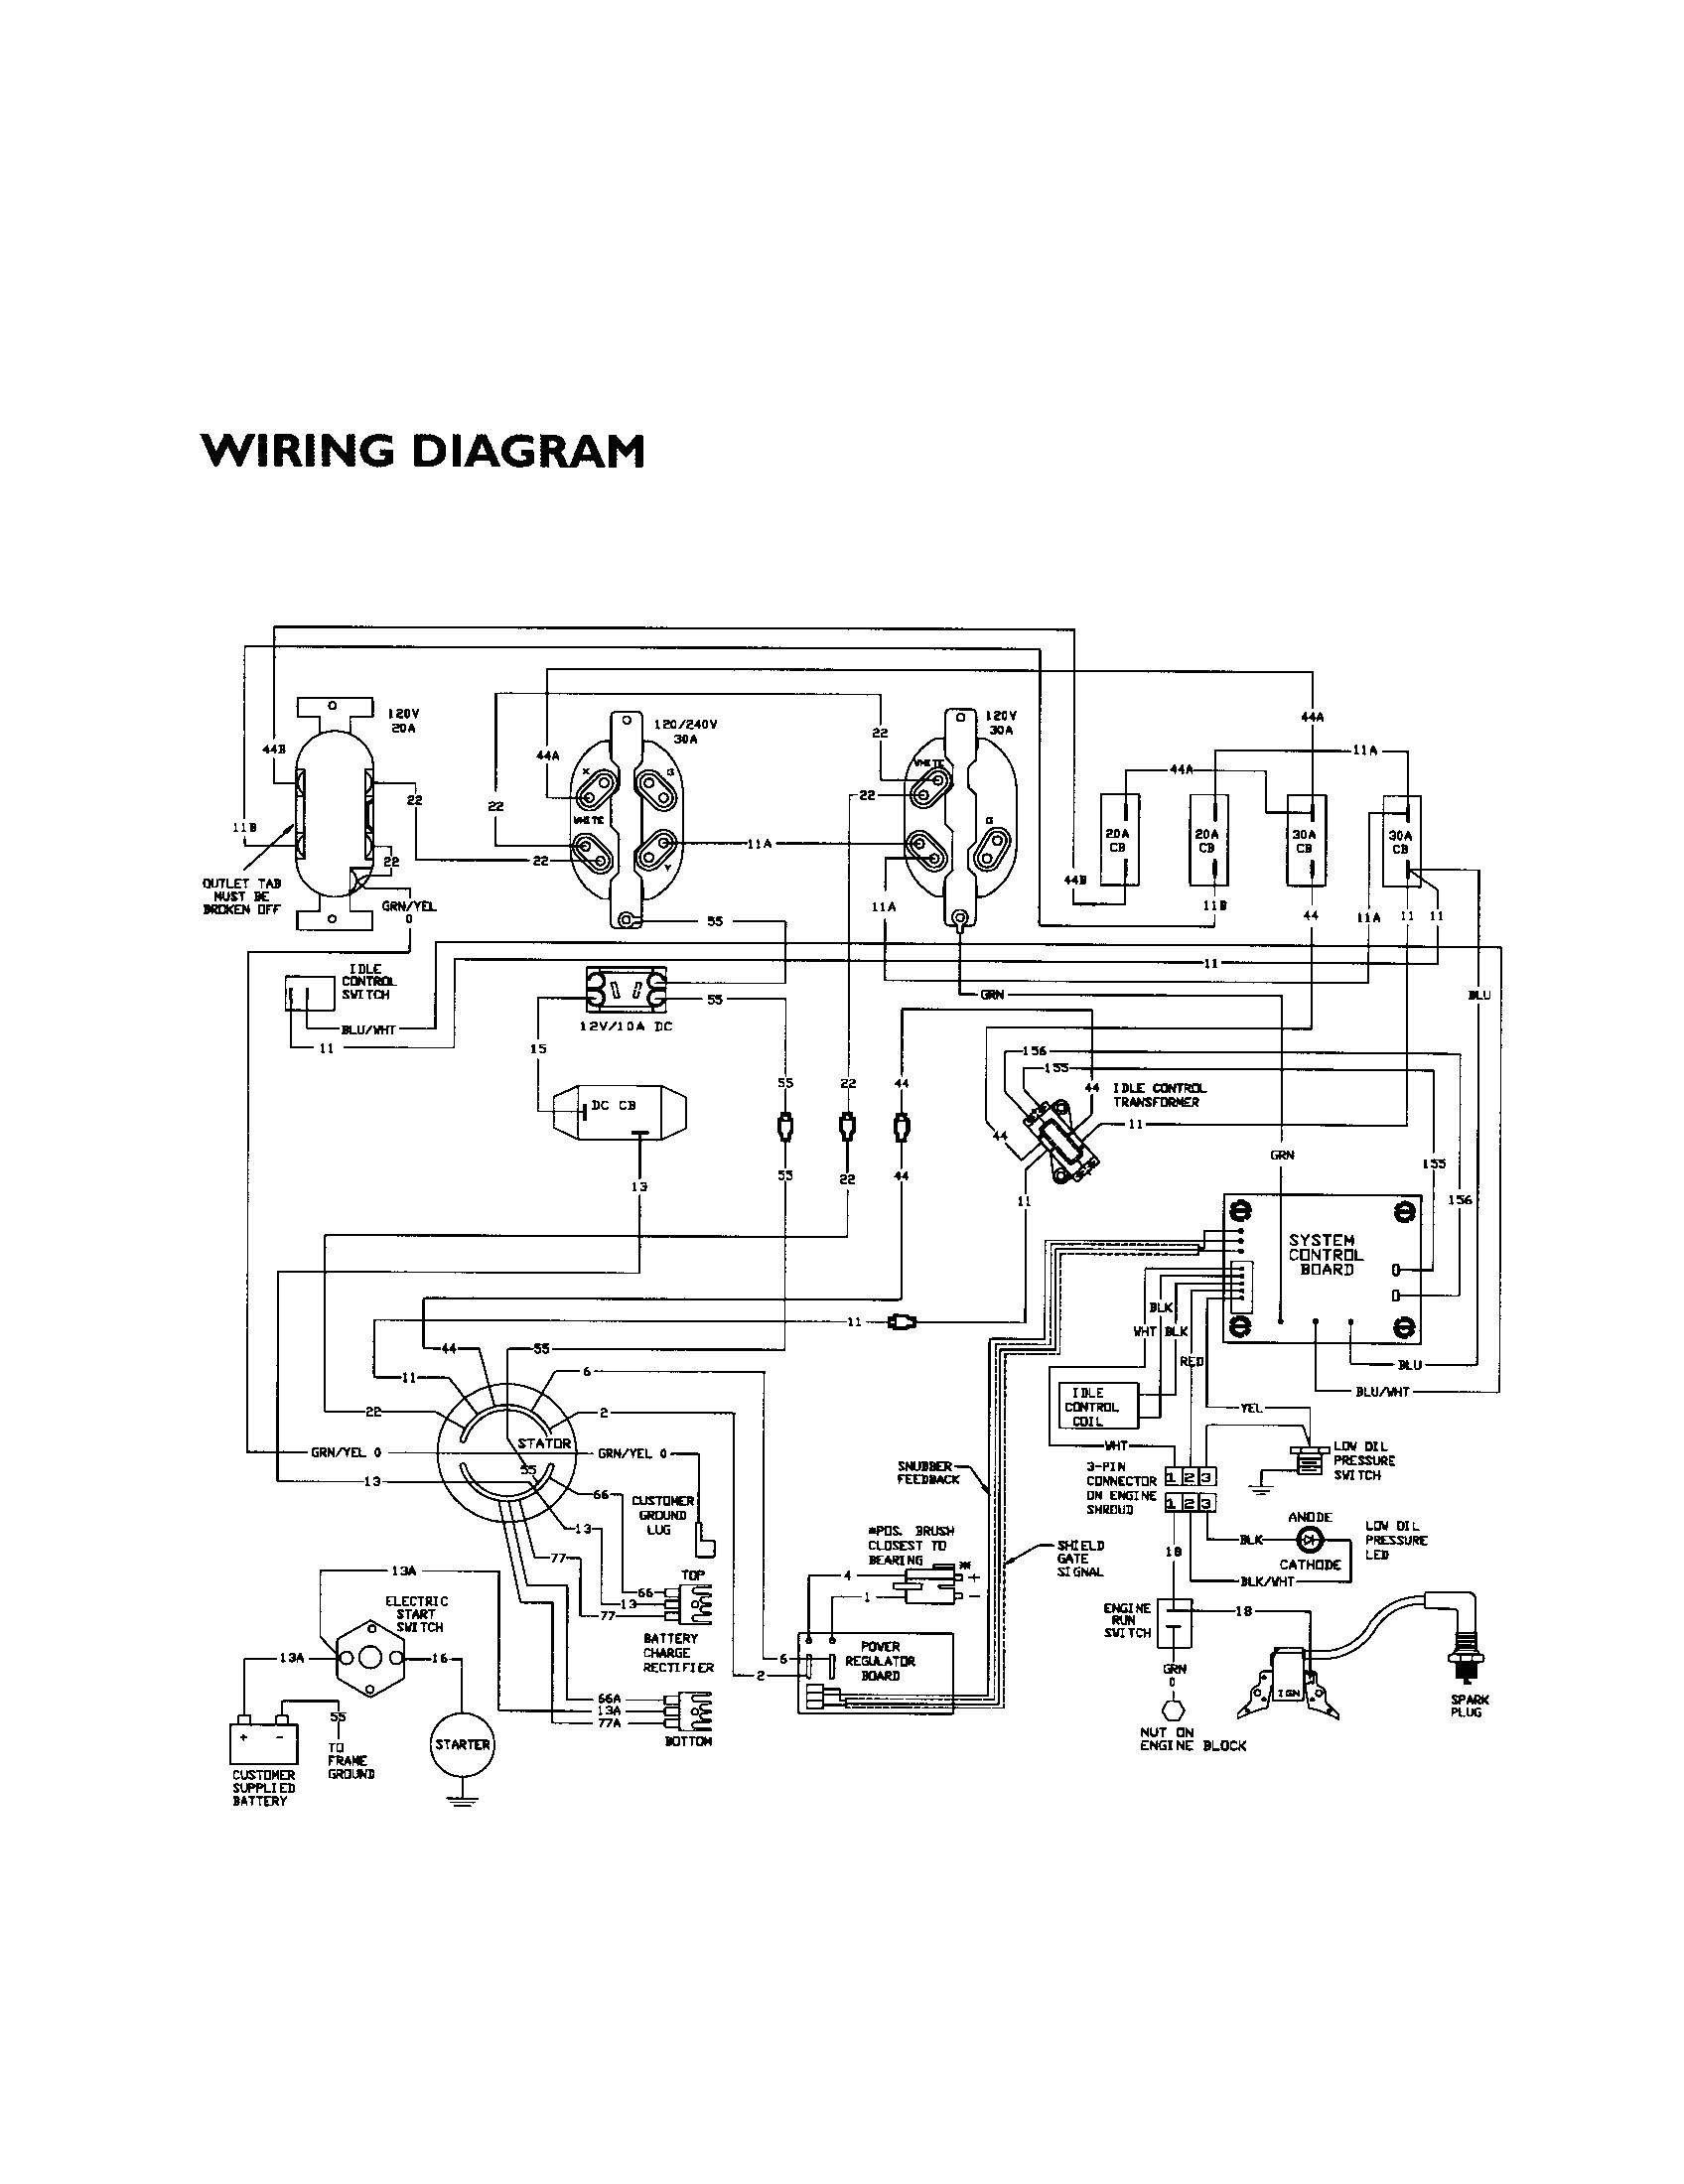 Generac Generator Wiring Diagram Generac Rtf 3 Phase Transfer Switch Wiring Diagram Just Wiring Diagram